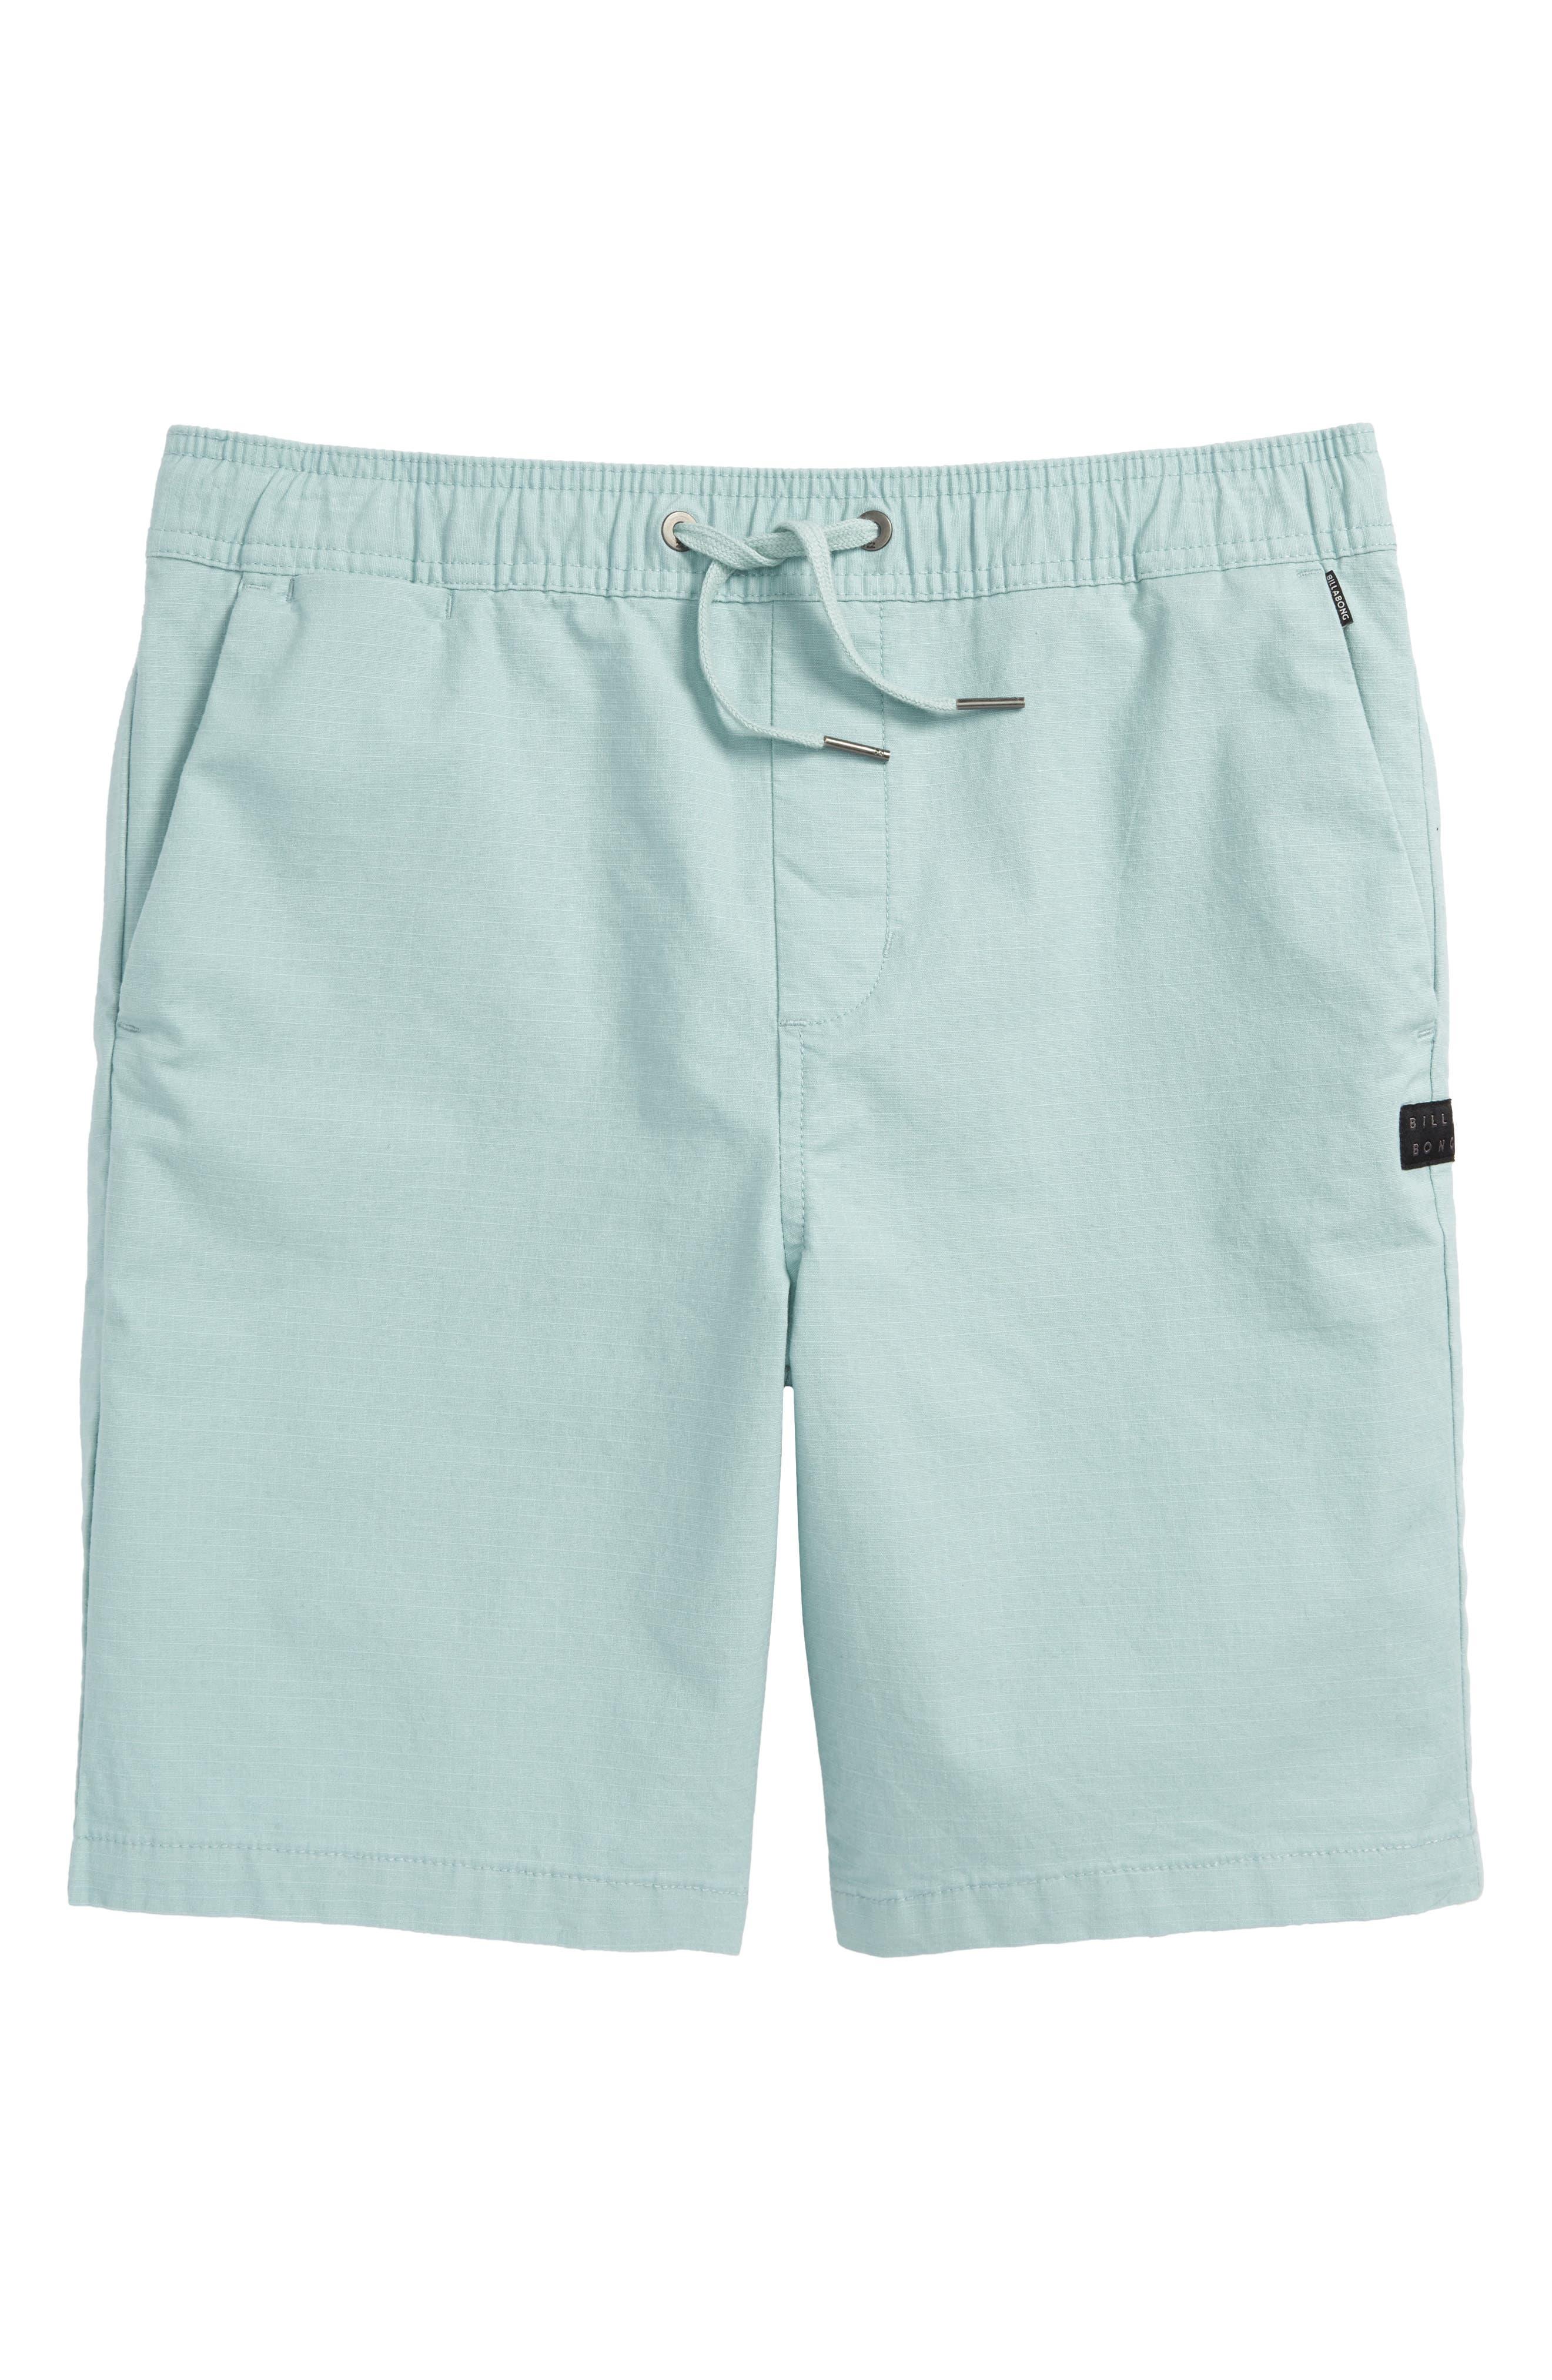 Larry Layback Shorts,                             Main thumbnail 1, color,                             Dark Ozone